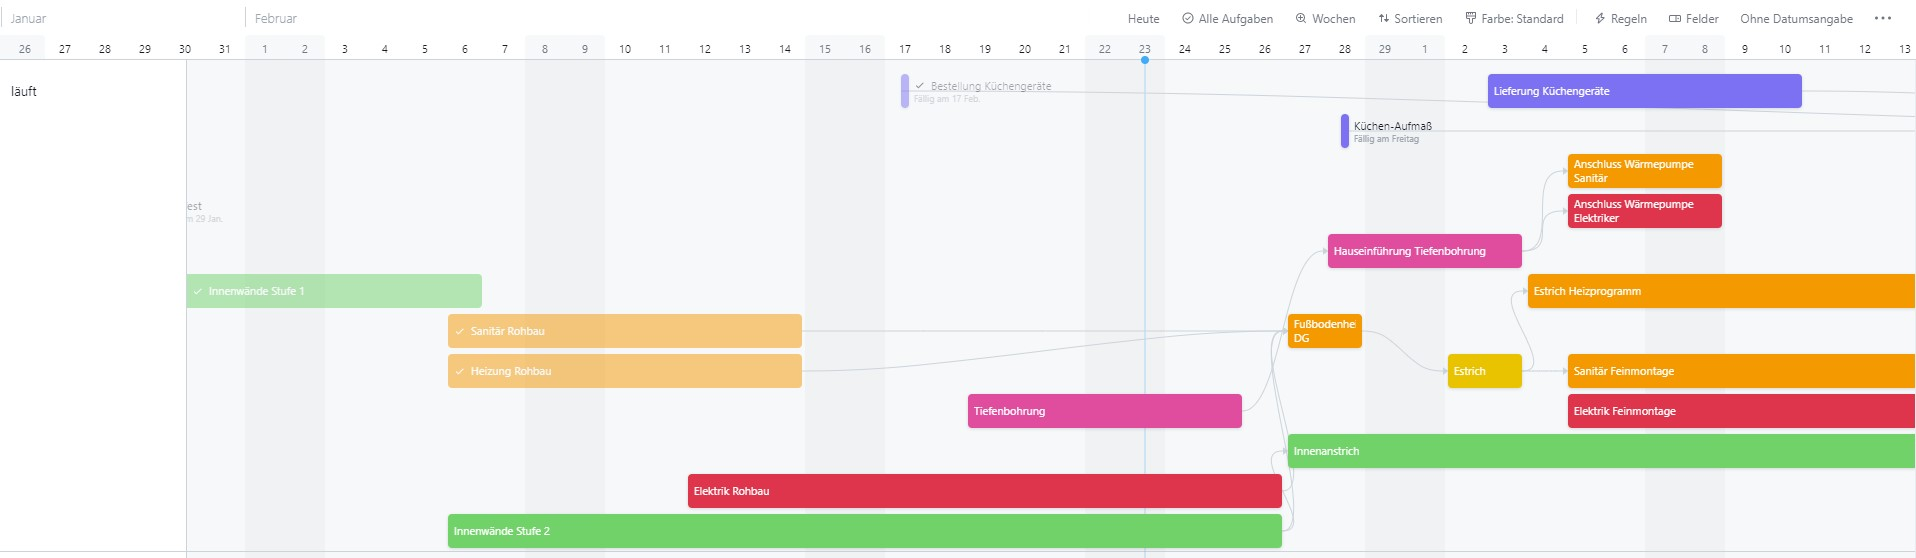 Zeitplan Innenausbau